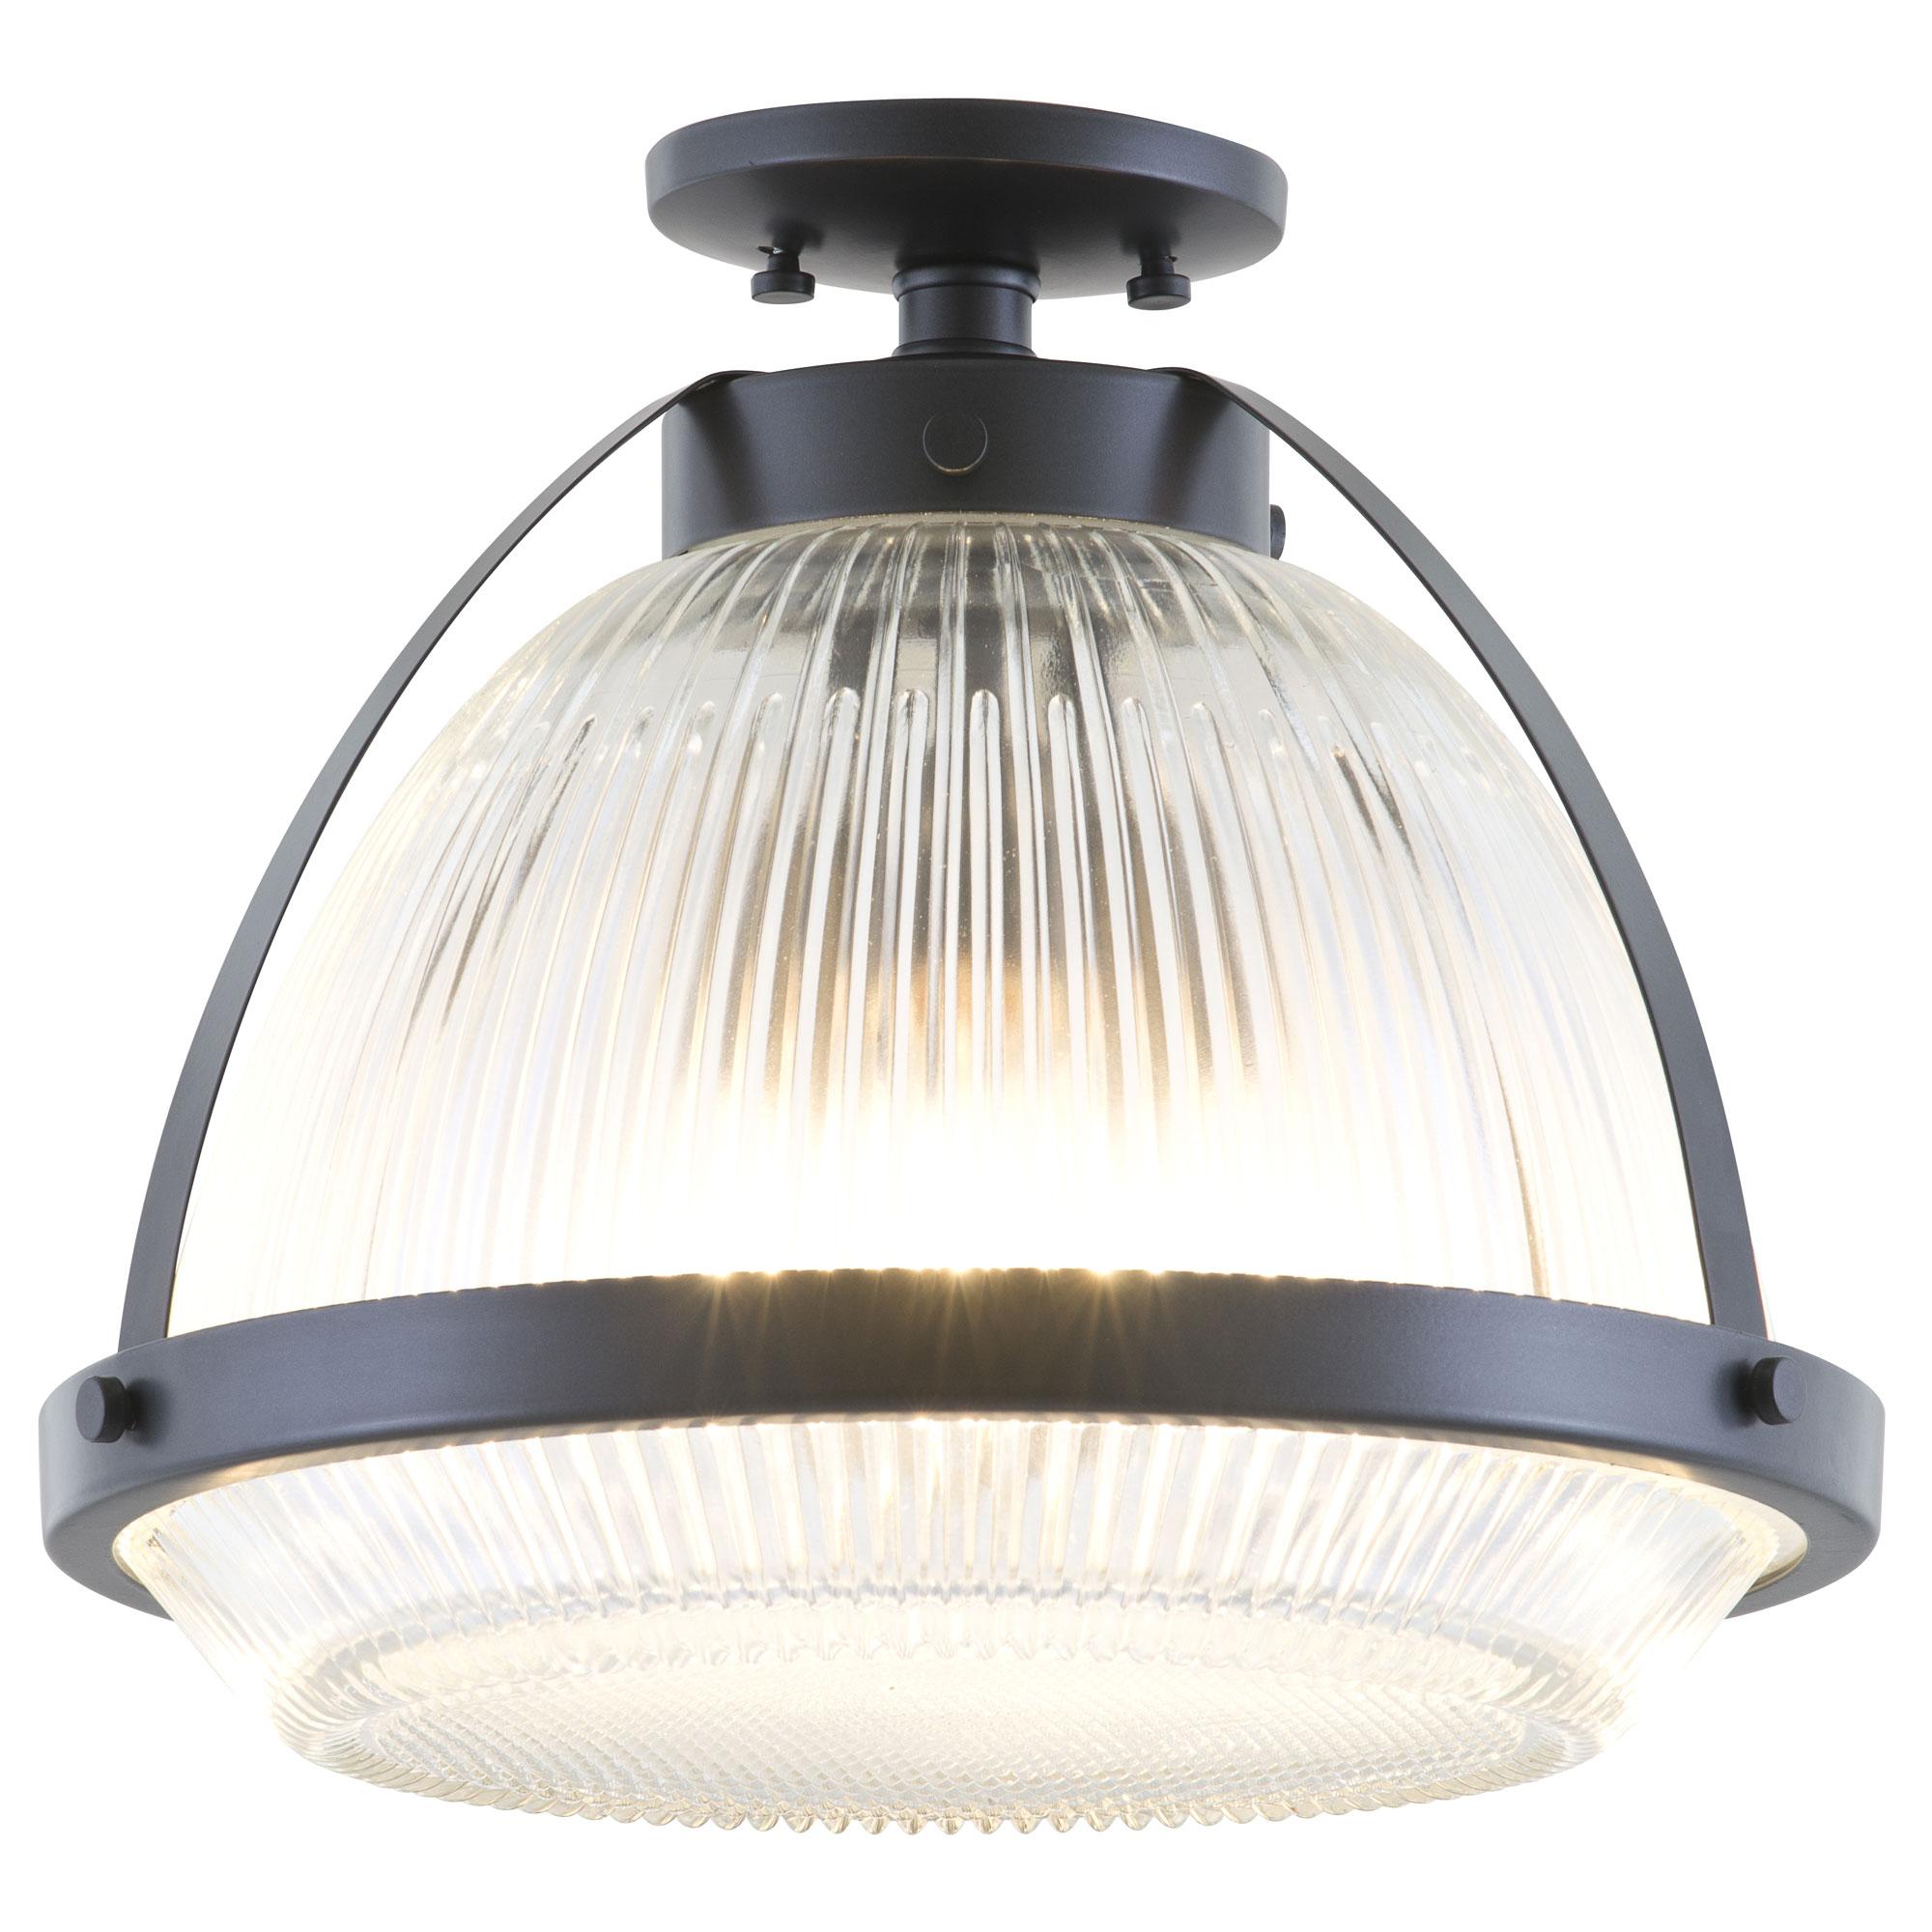 design mount ceilings lights superior unique dlrn ceiling flush